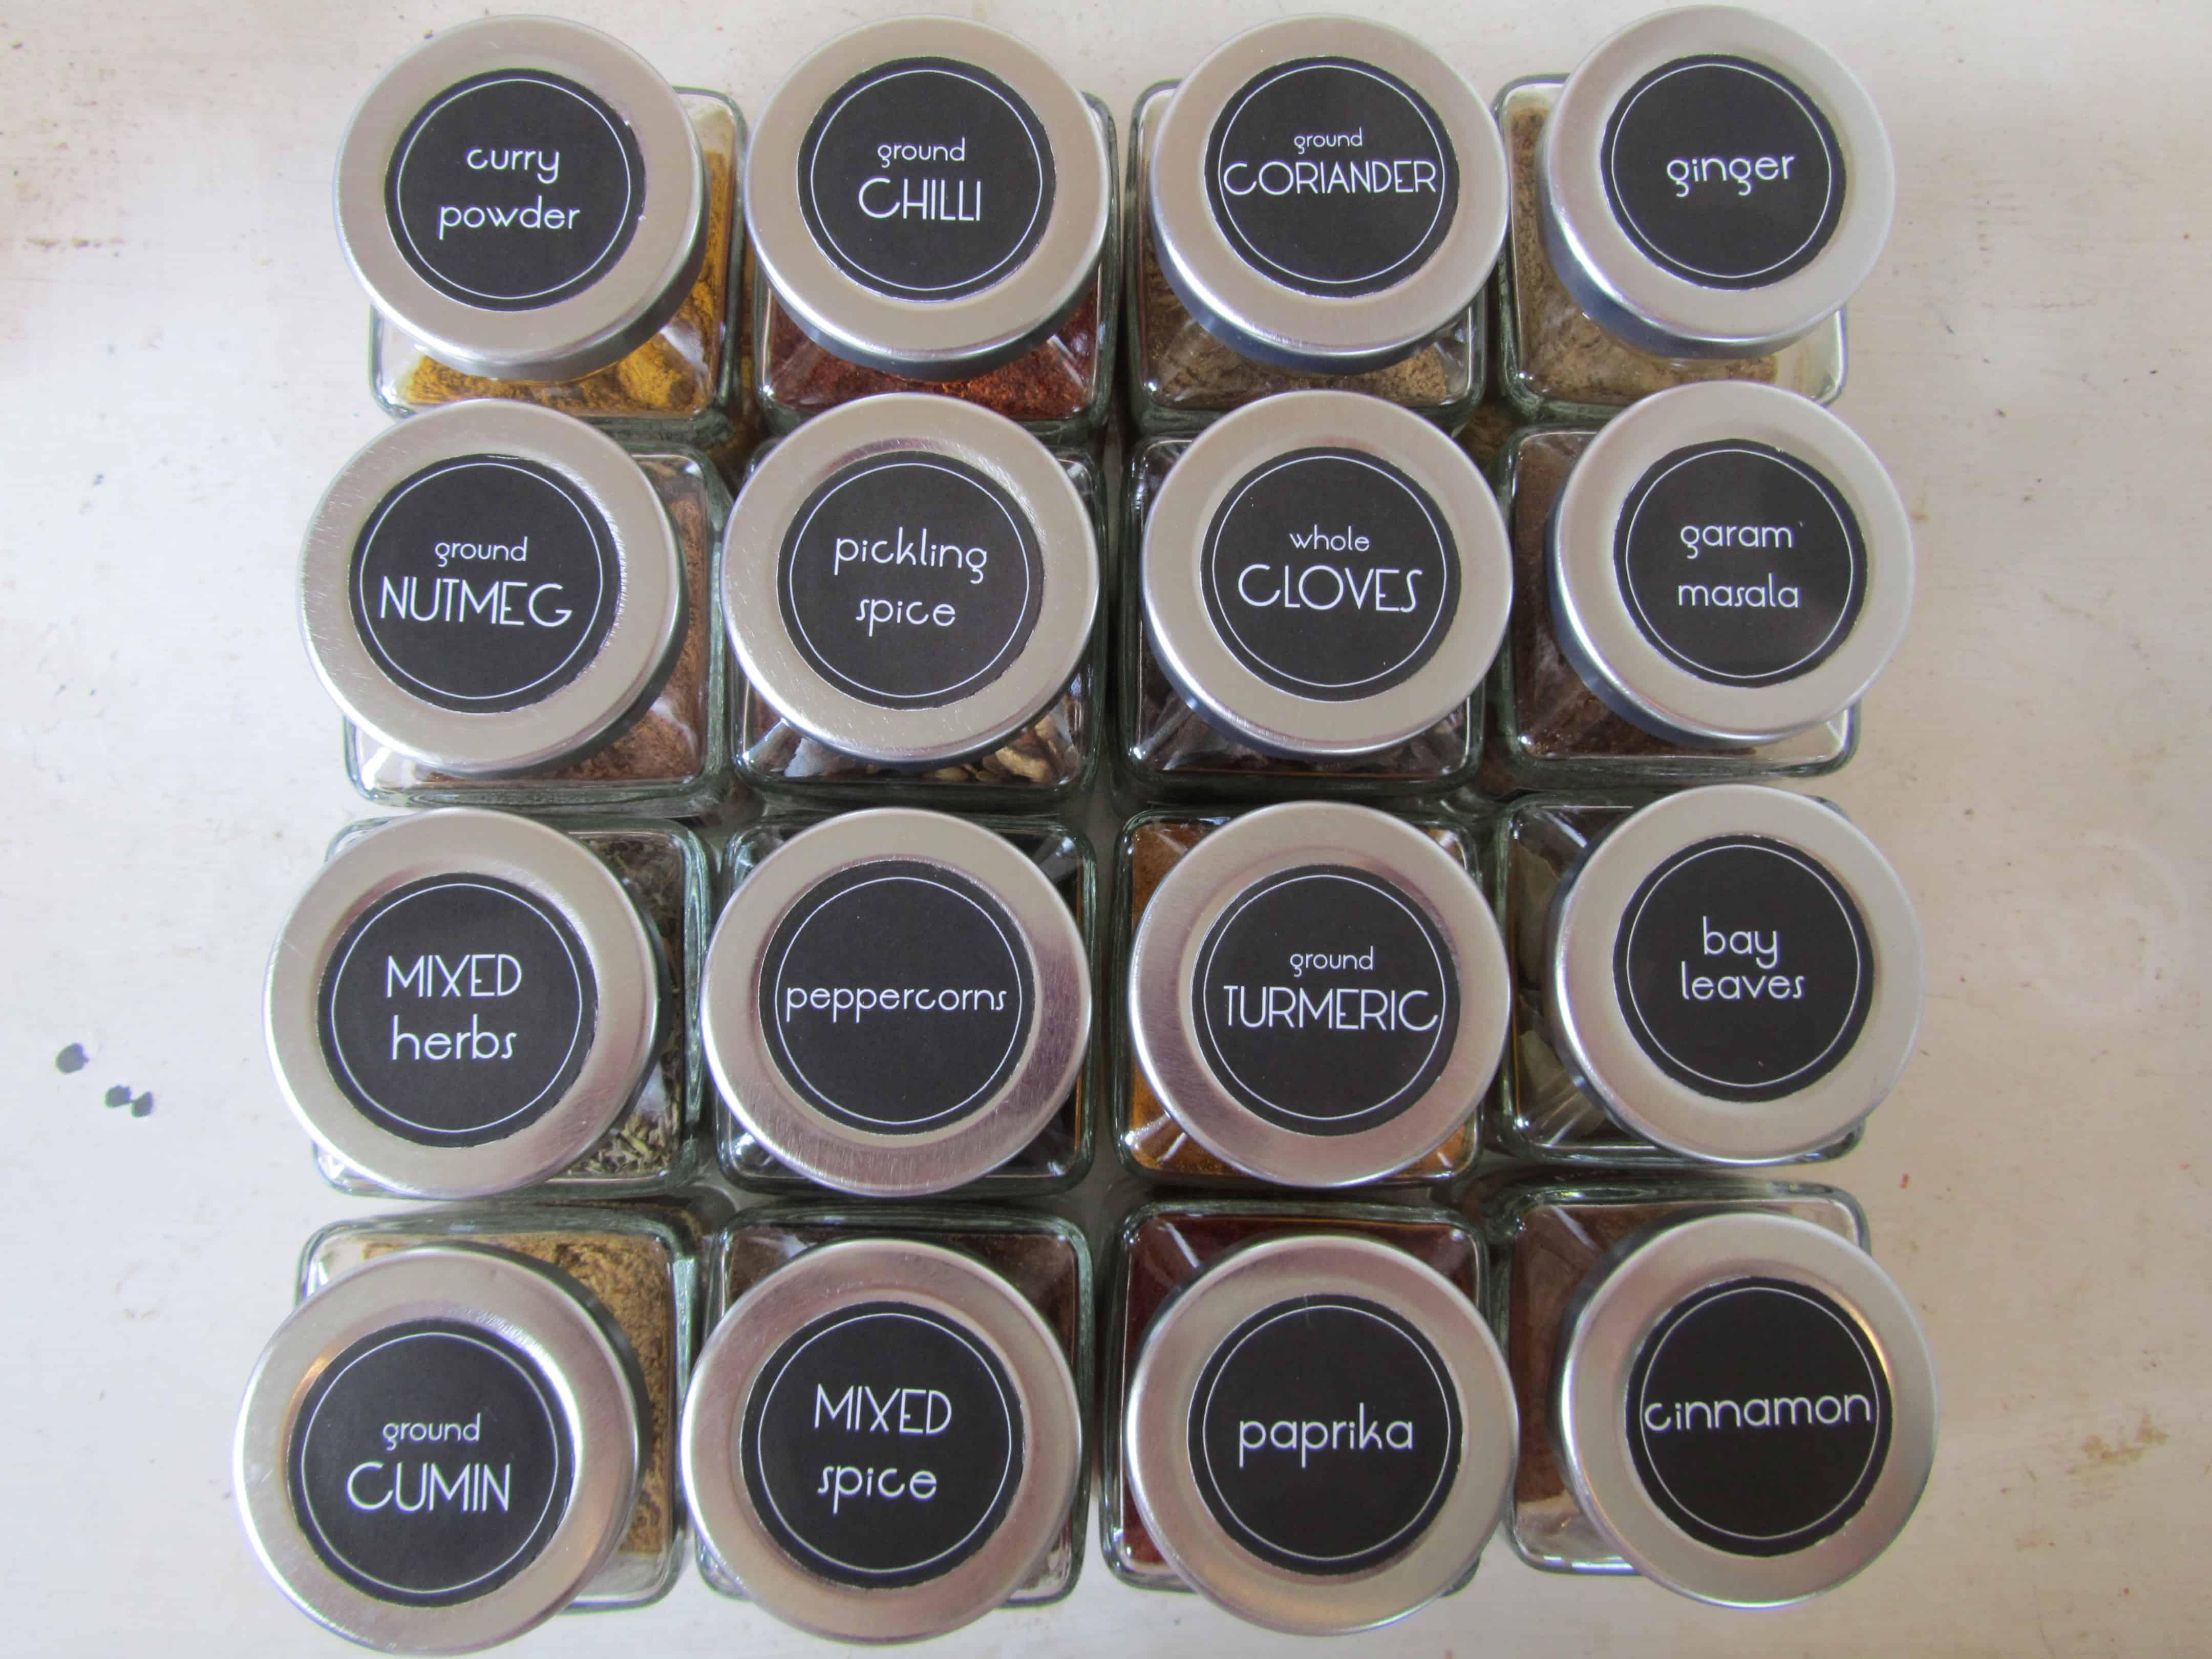 picture regarding Printable Spice Jar Labels identify Spice jar labels (with totally free printables!) The Kiwi Region Lady